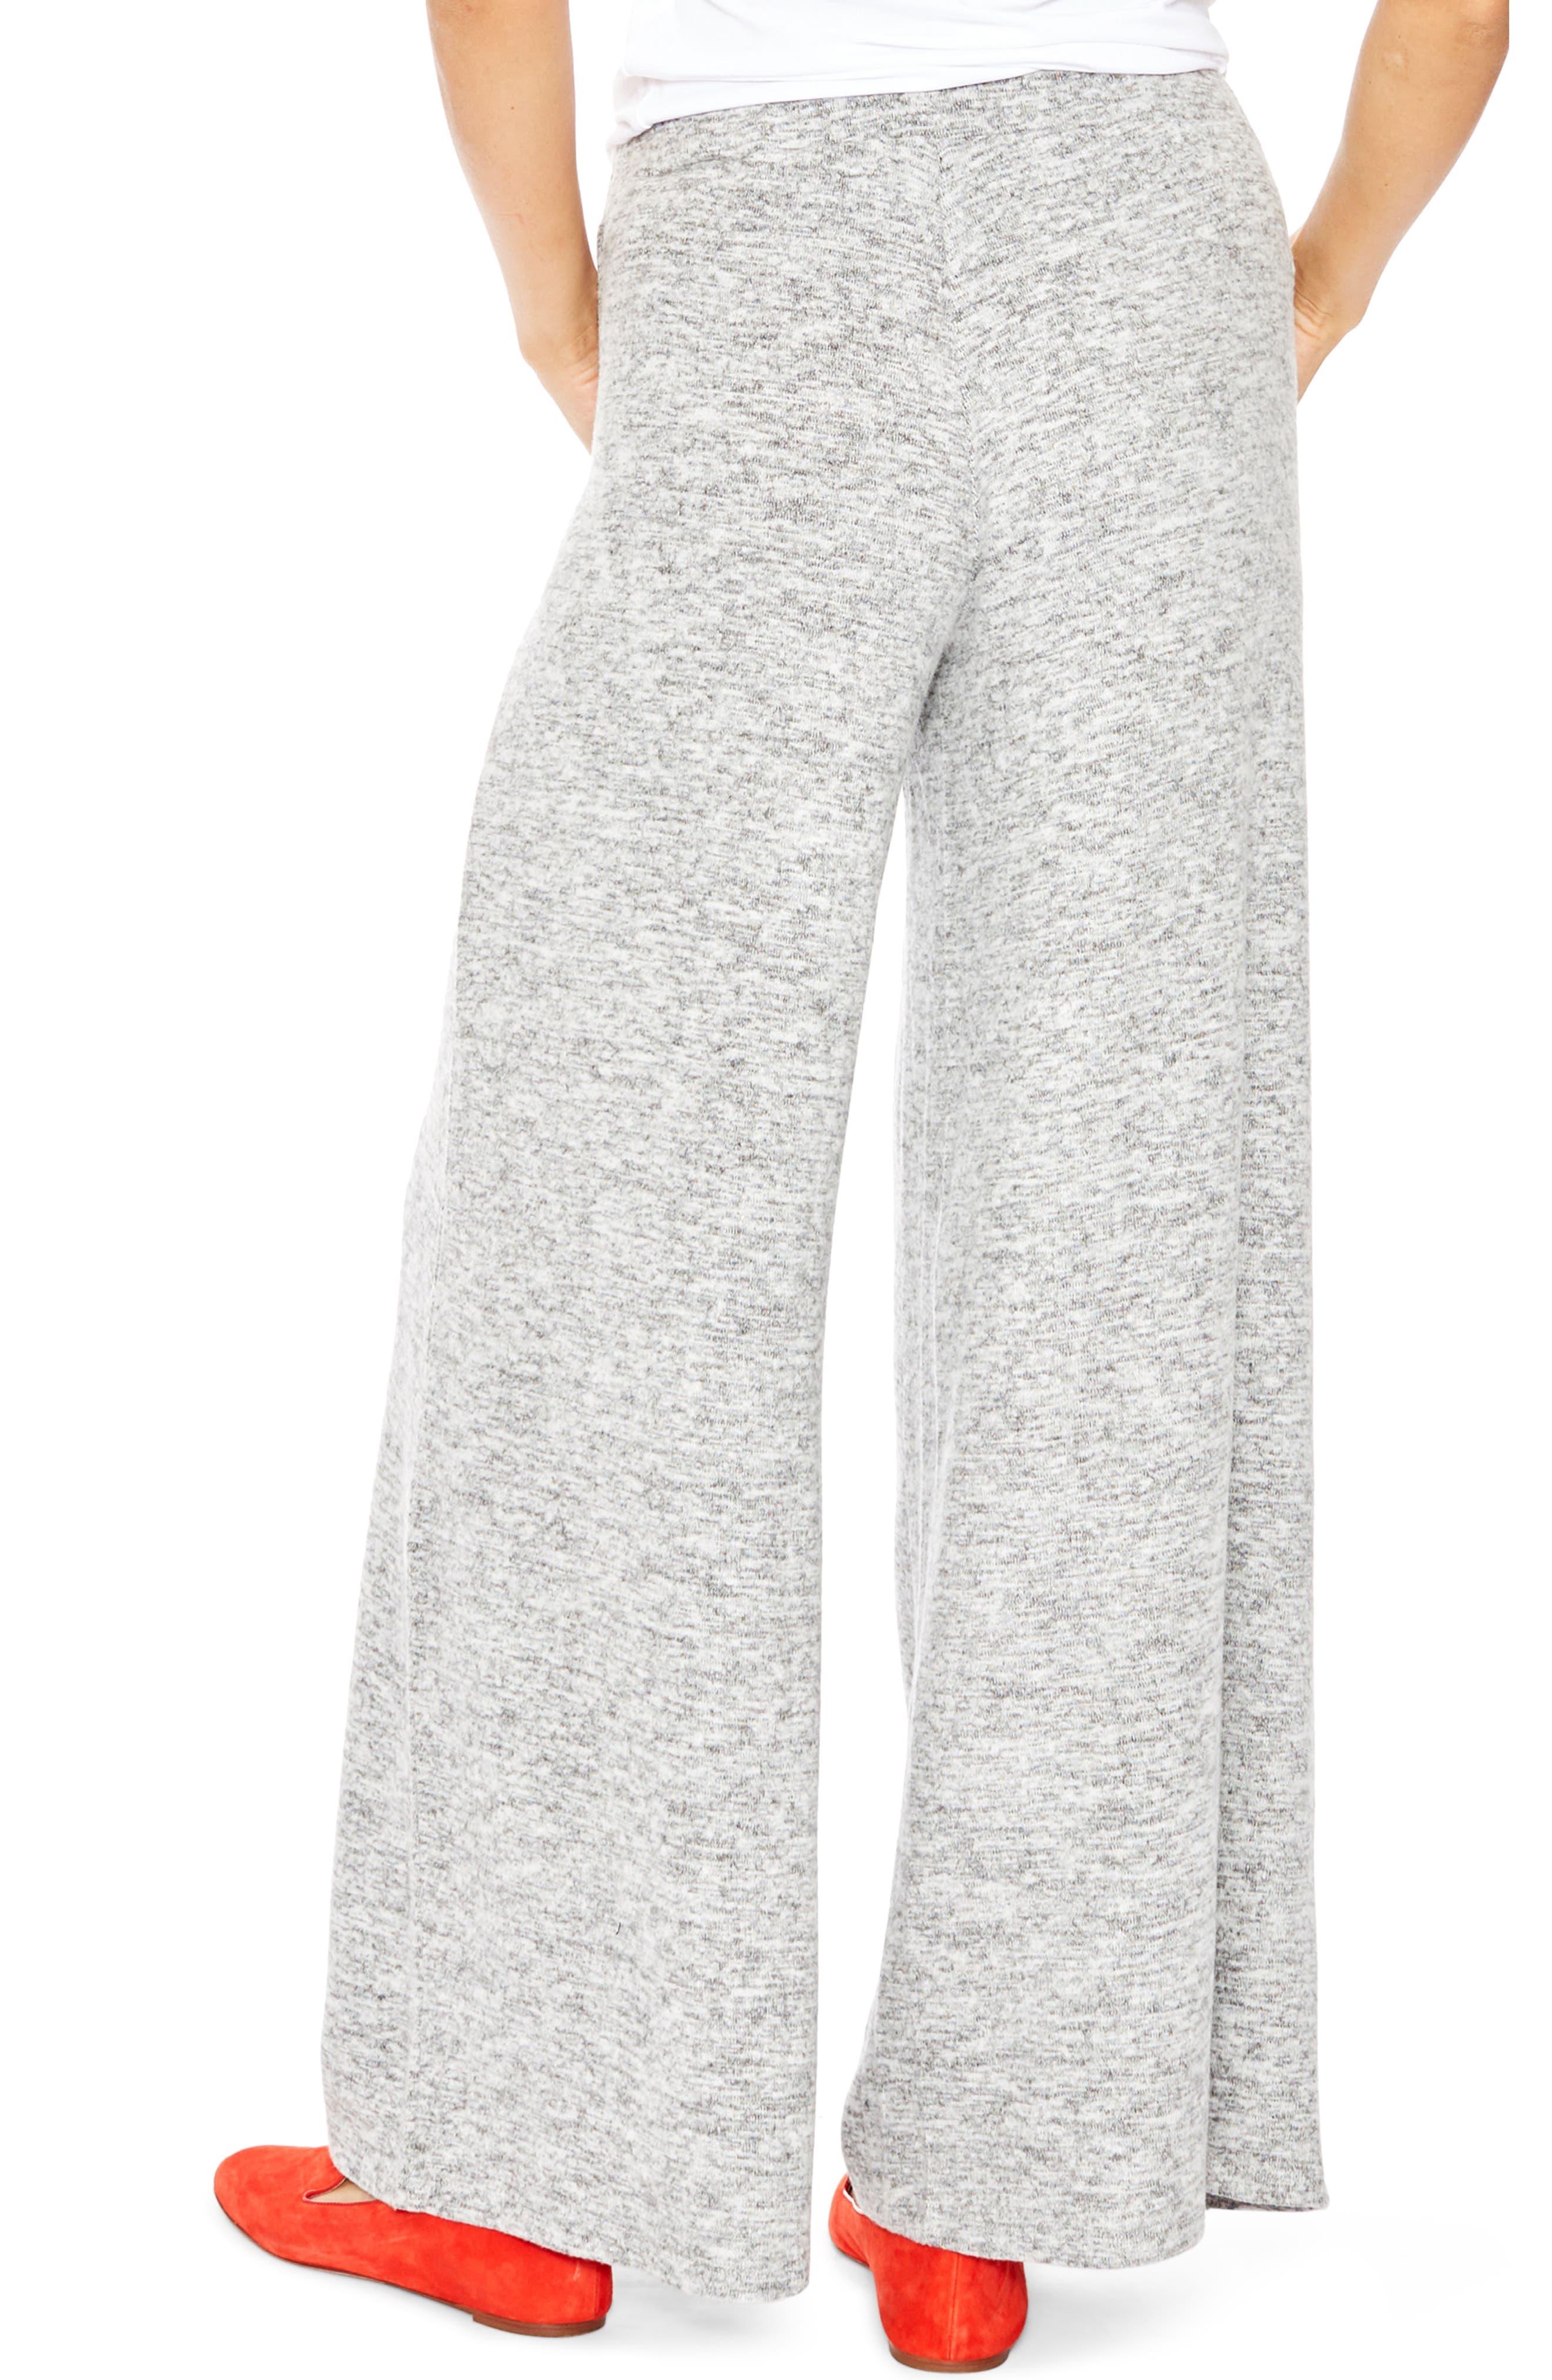 Riley Maternity Sweatpants,                             Alternate thumbnail 2, color,                             Grey Melange